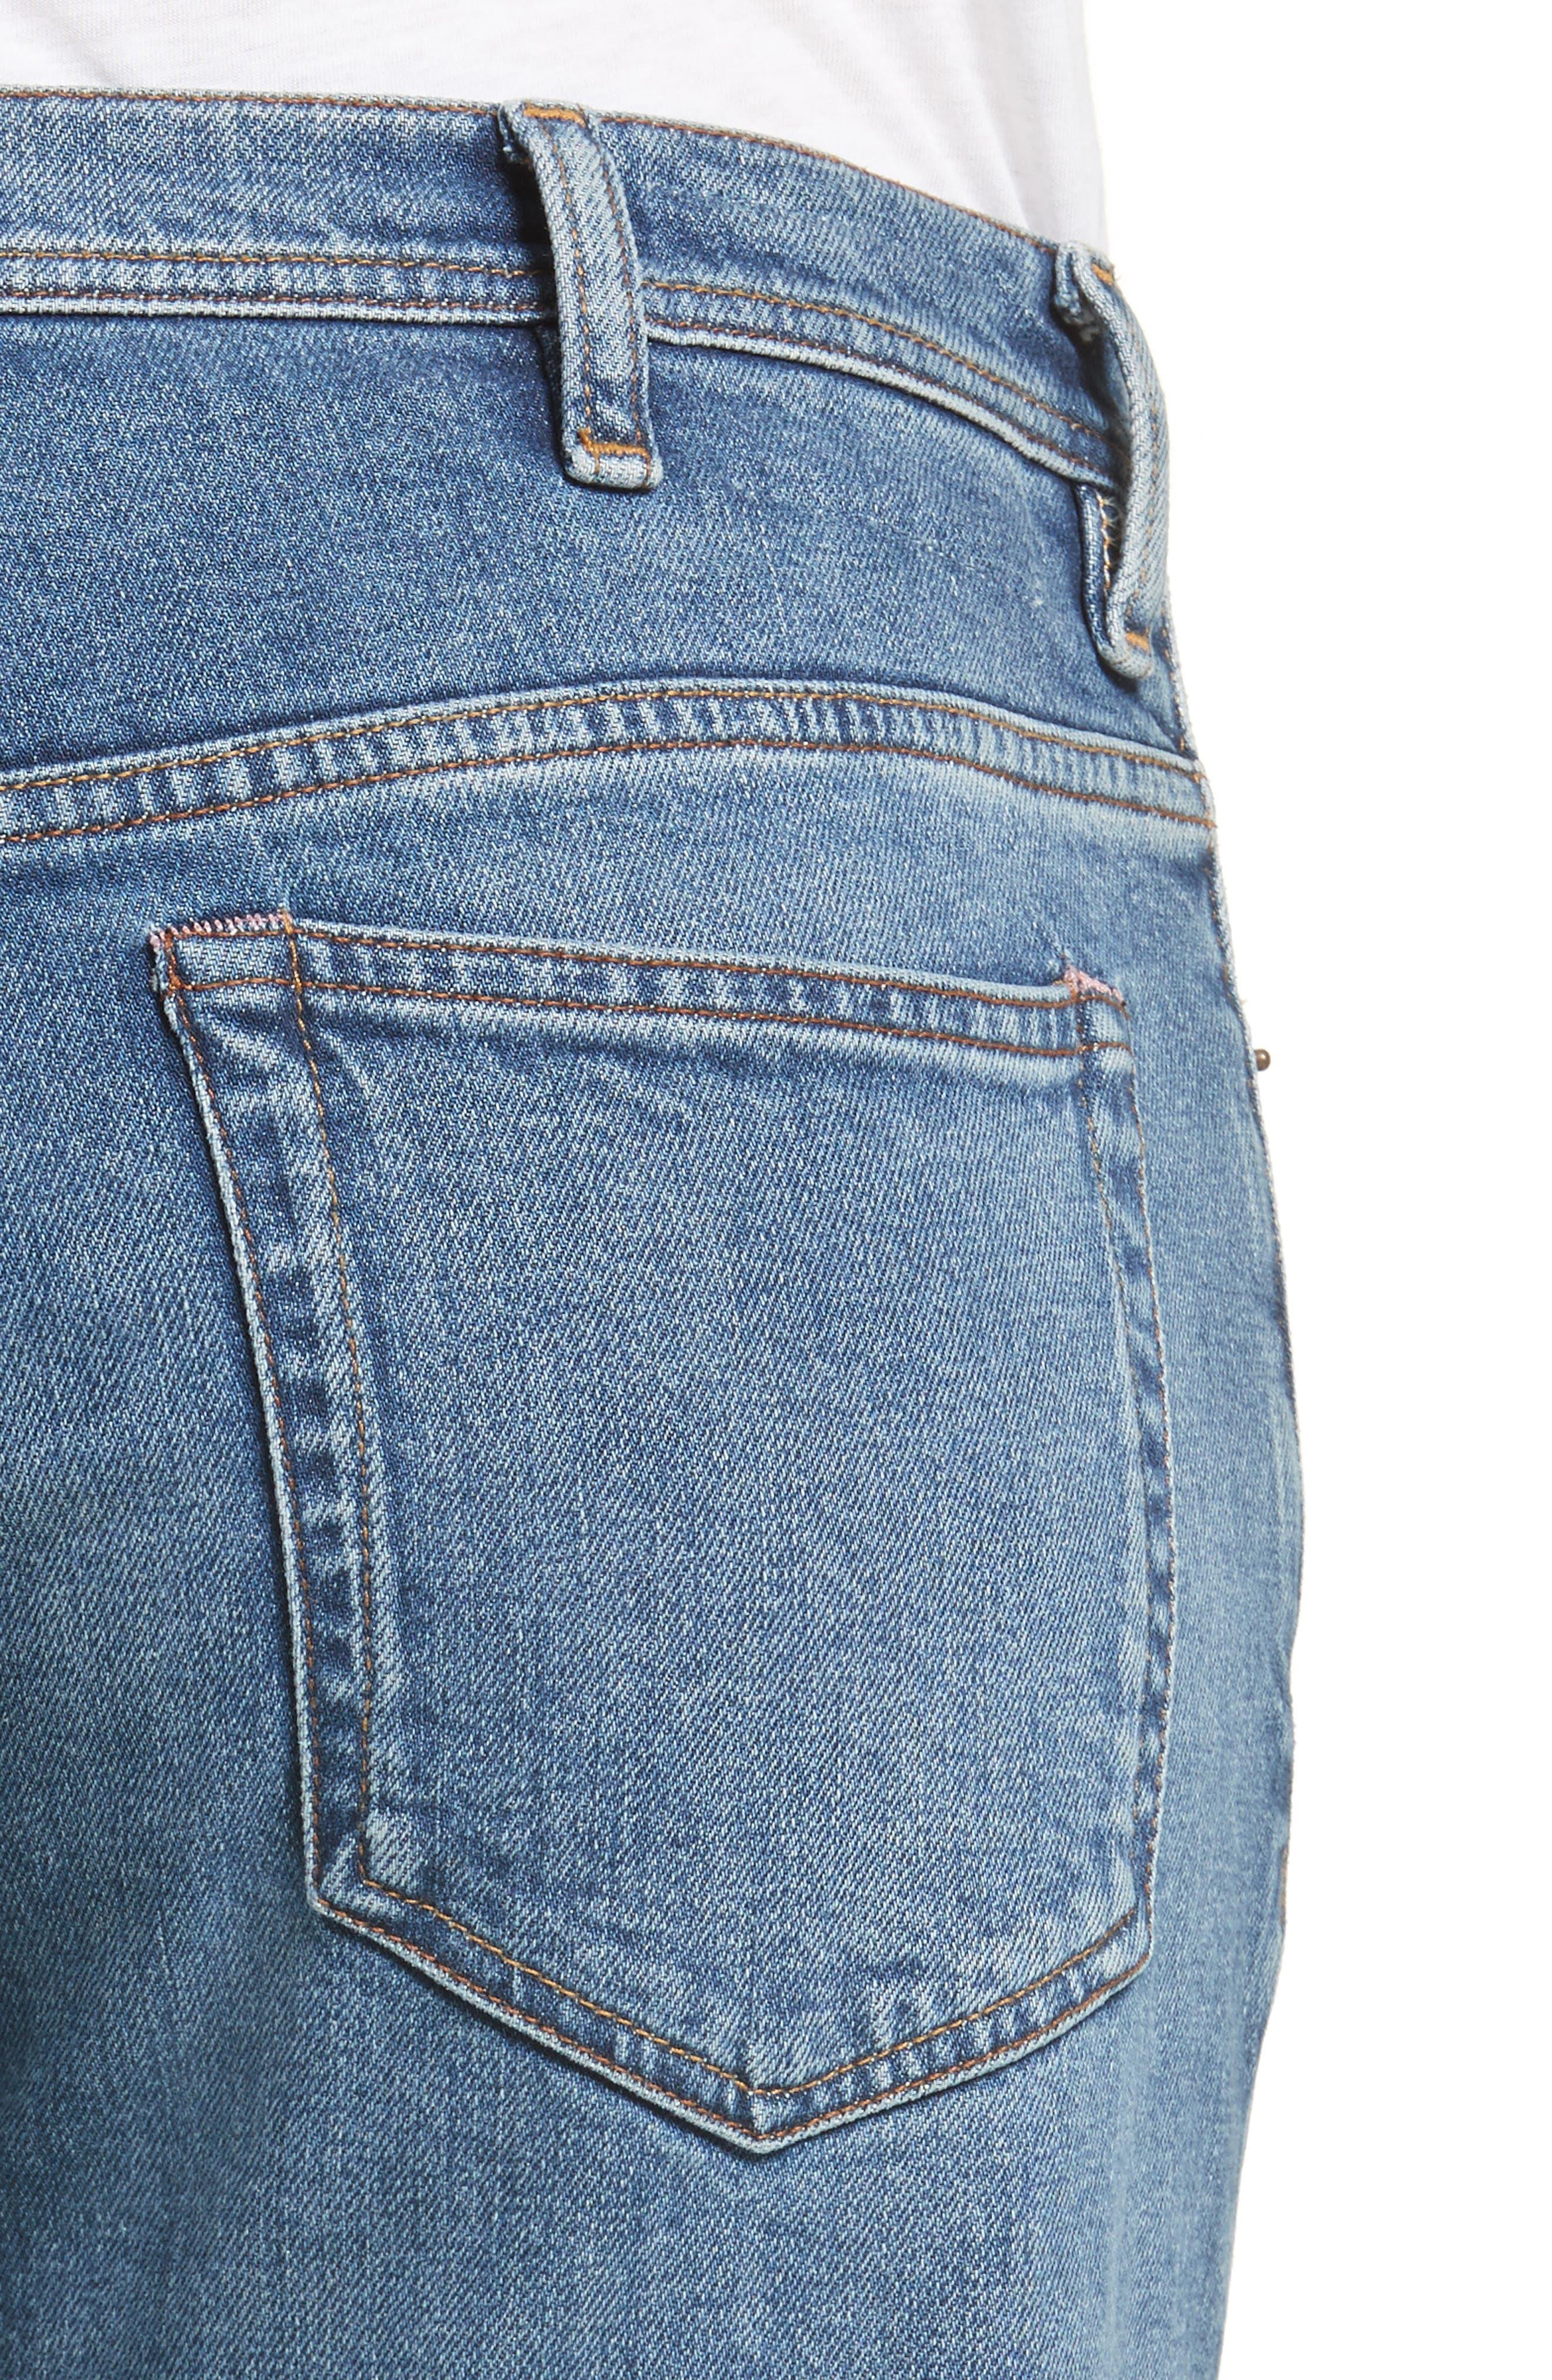 River Slim Taper Jeans,                             Alternate thumbnail 4, color,                             MID BLUE